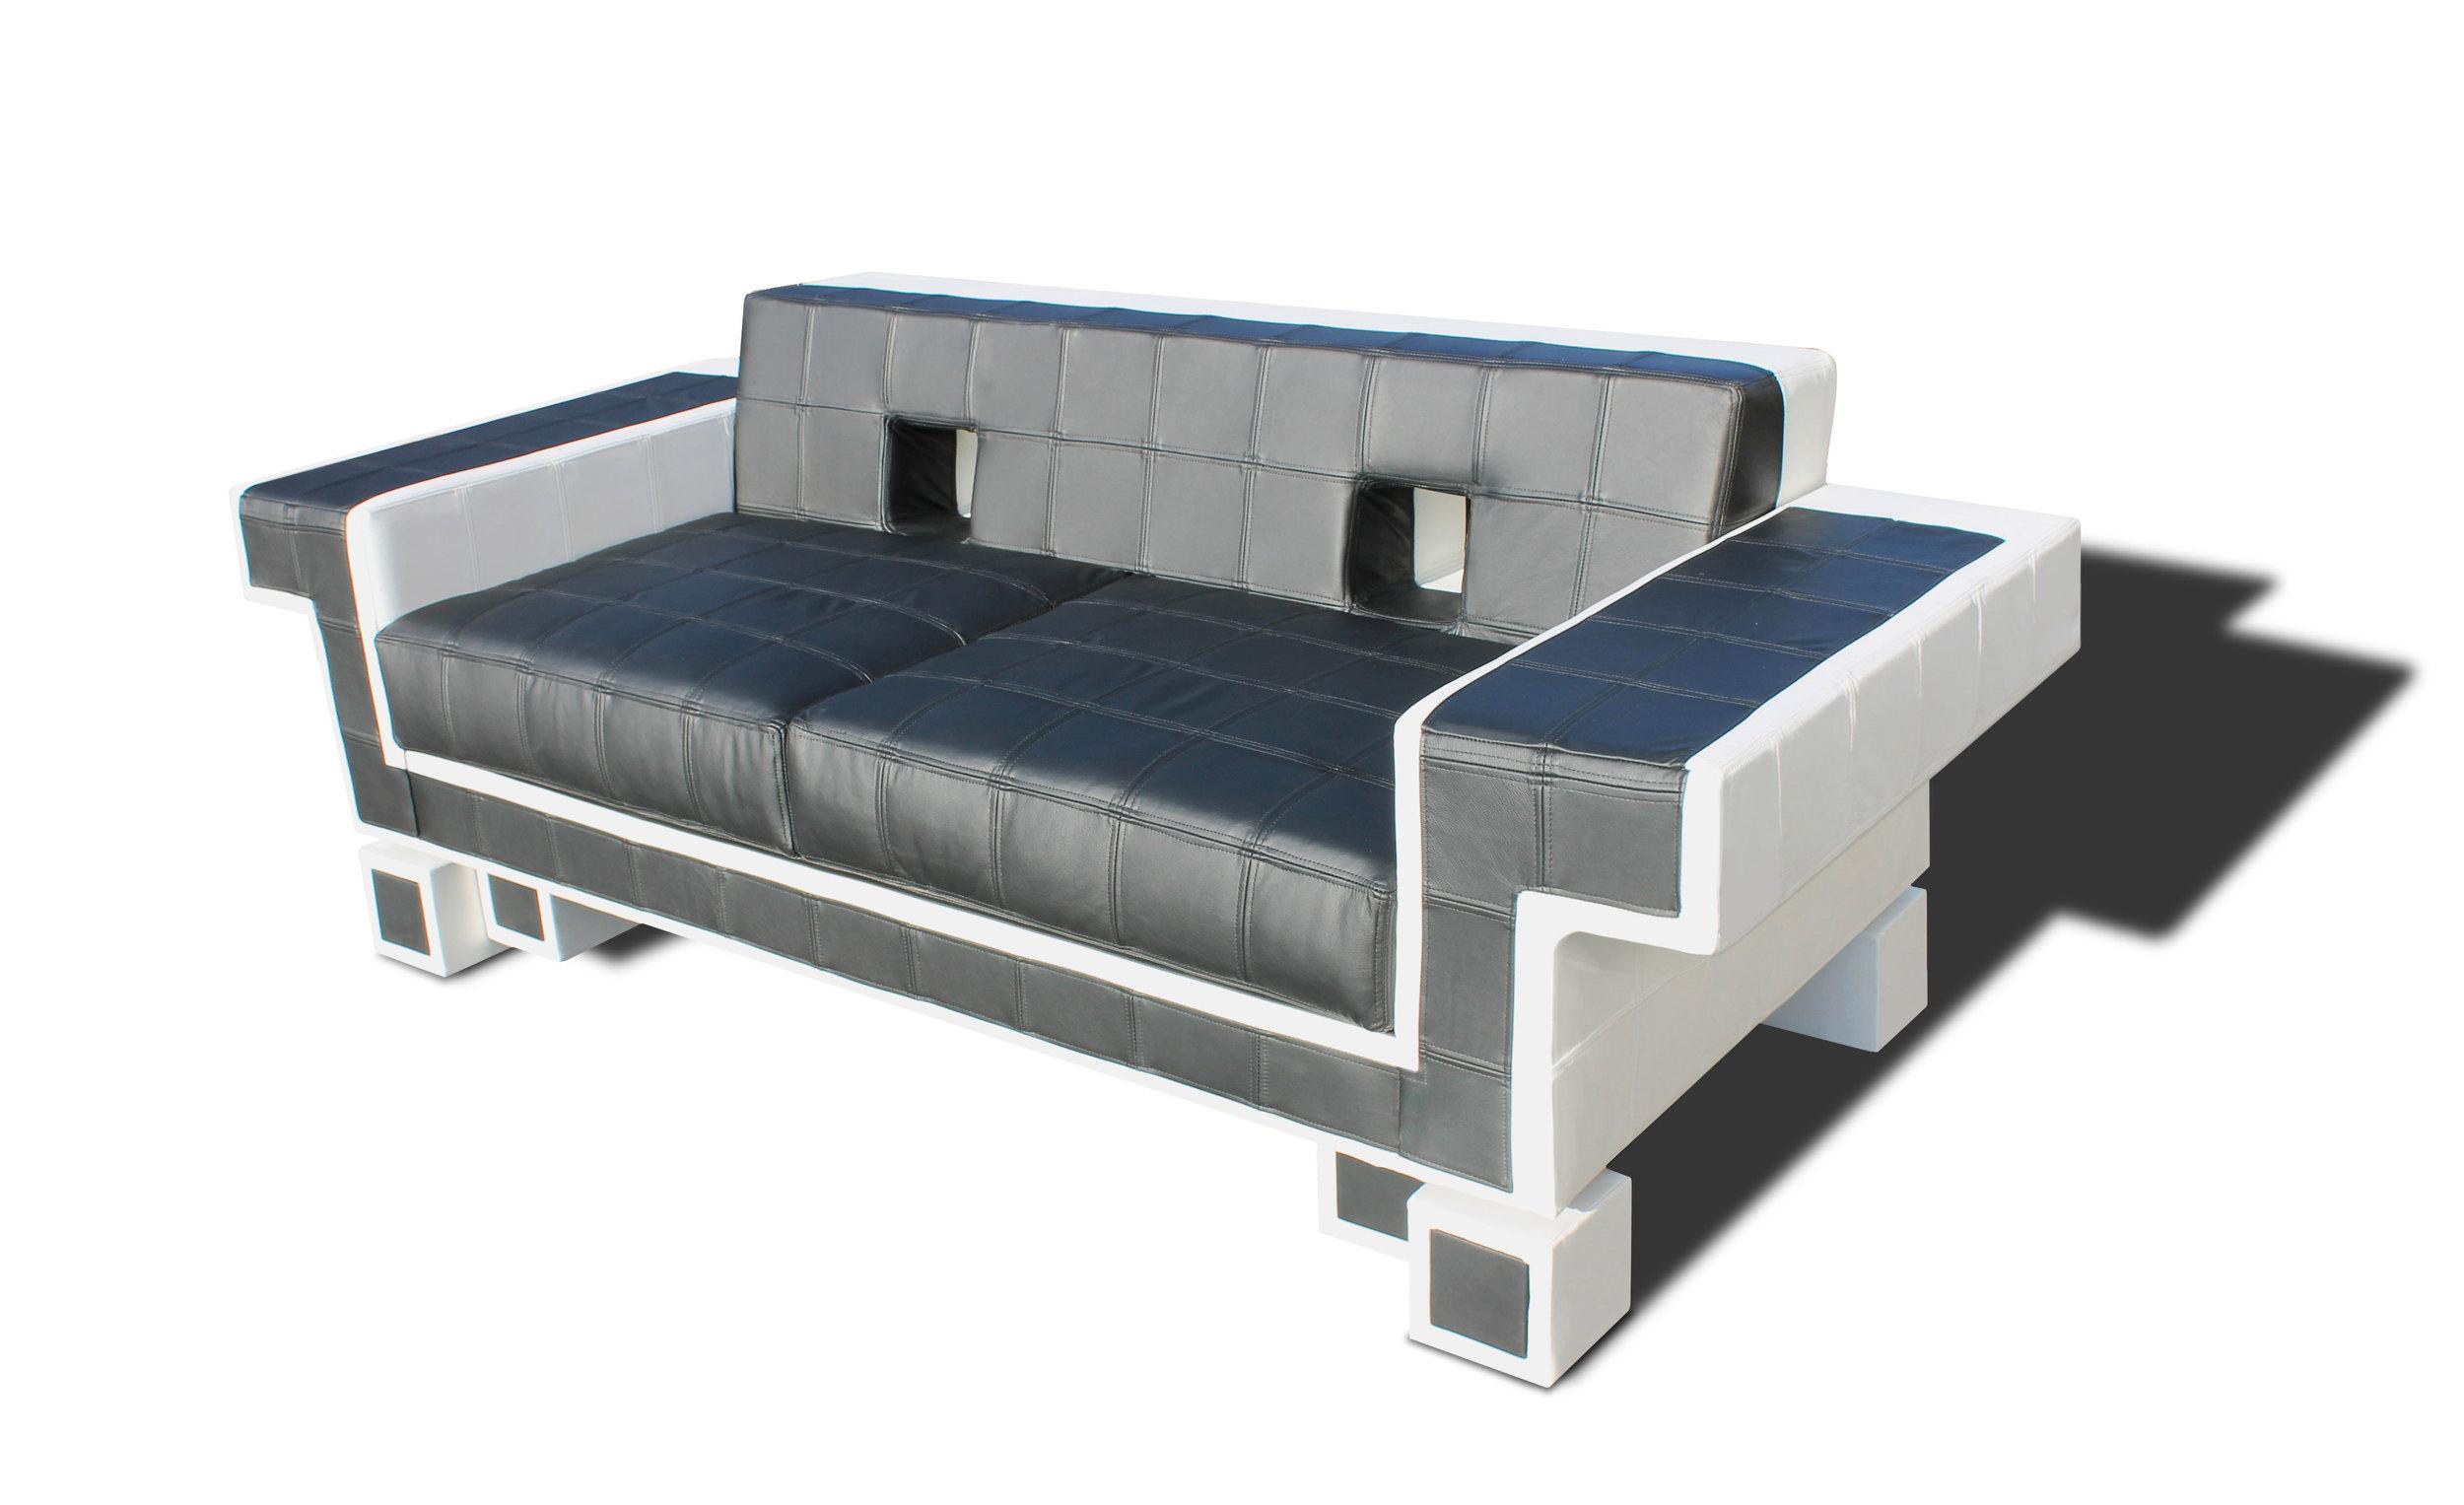 retro alien couch.jpg